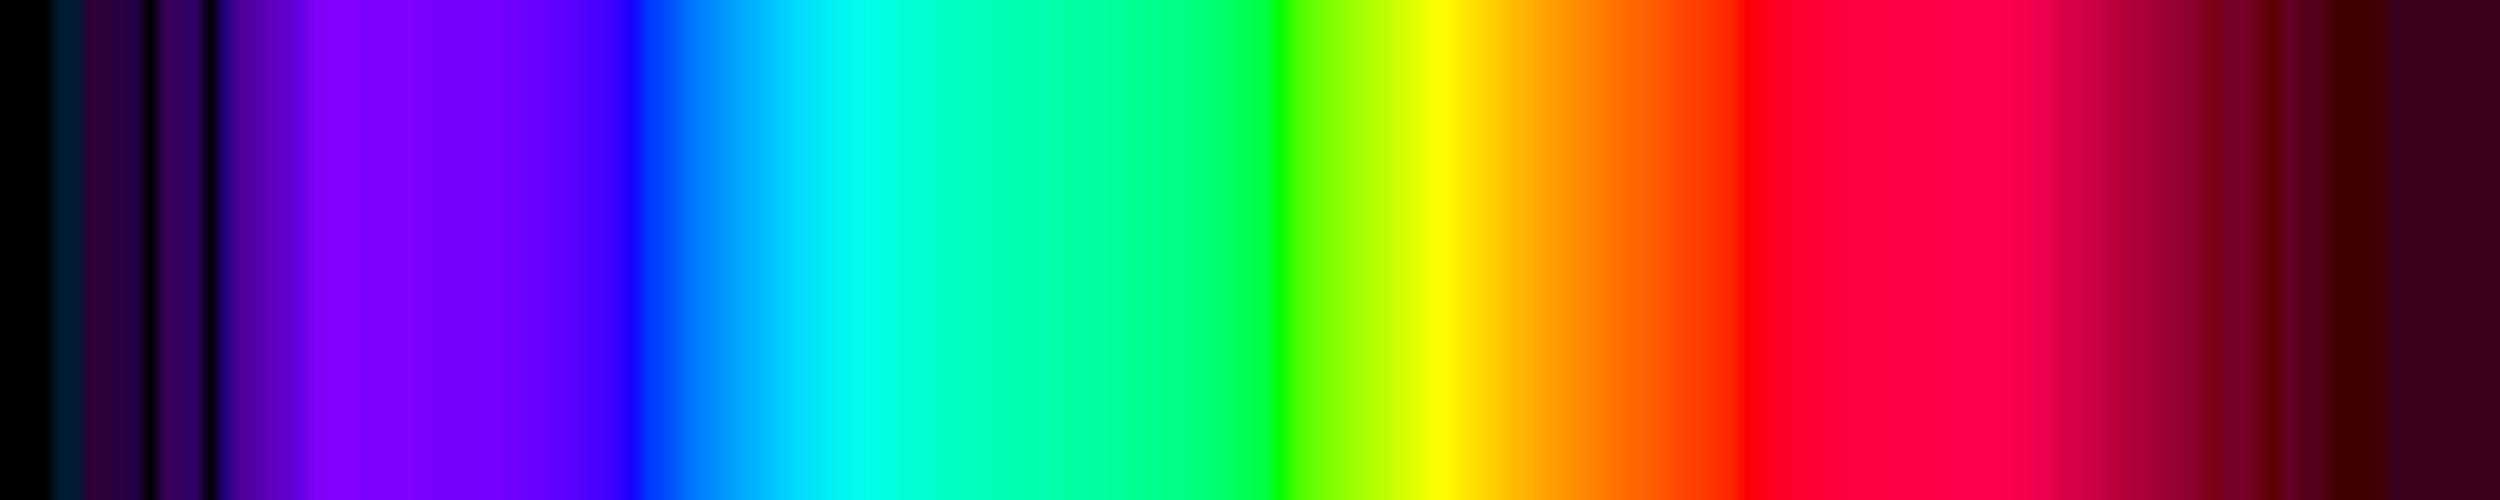 Color spectrum shown in RGB